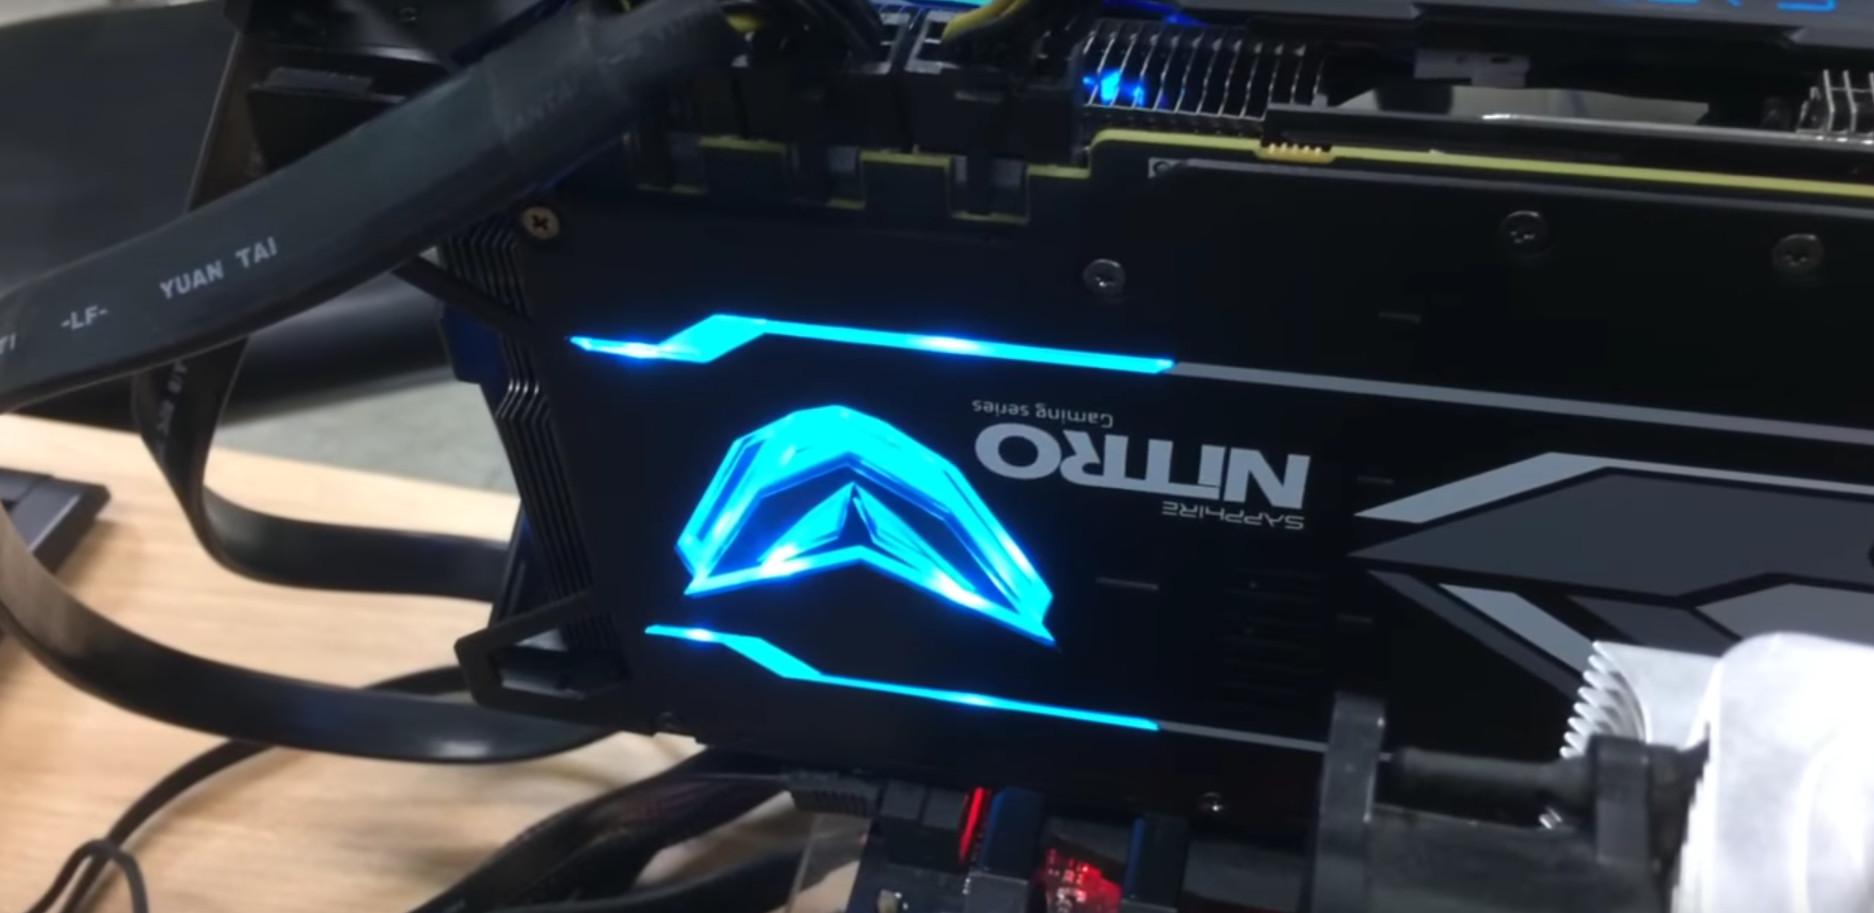 Sapphire Radeon Rx Vega 64 Nitro Custom Model Pictured